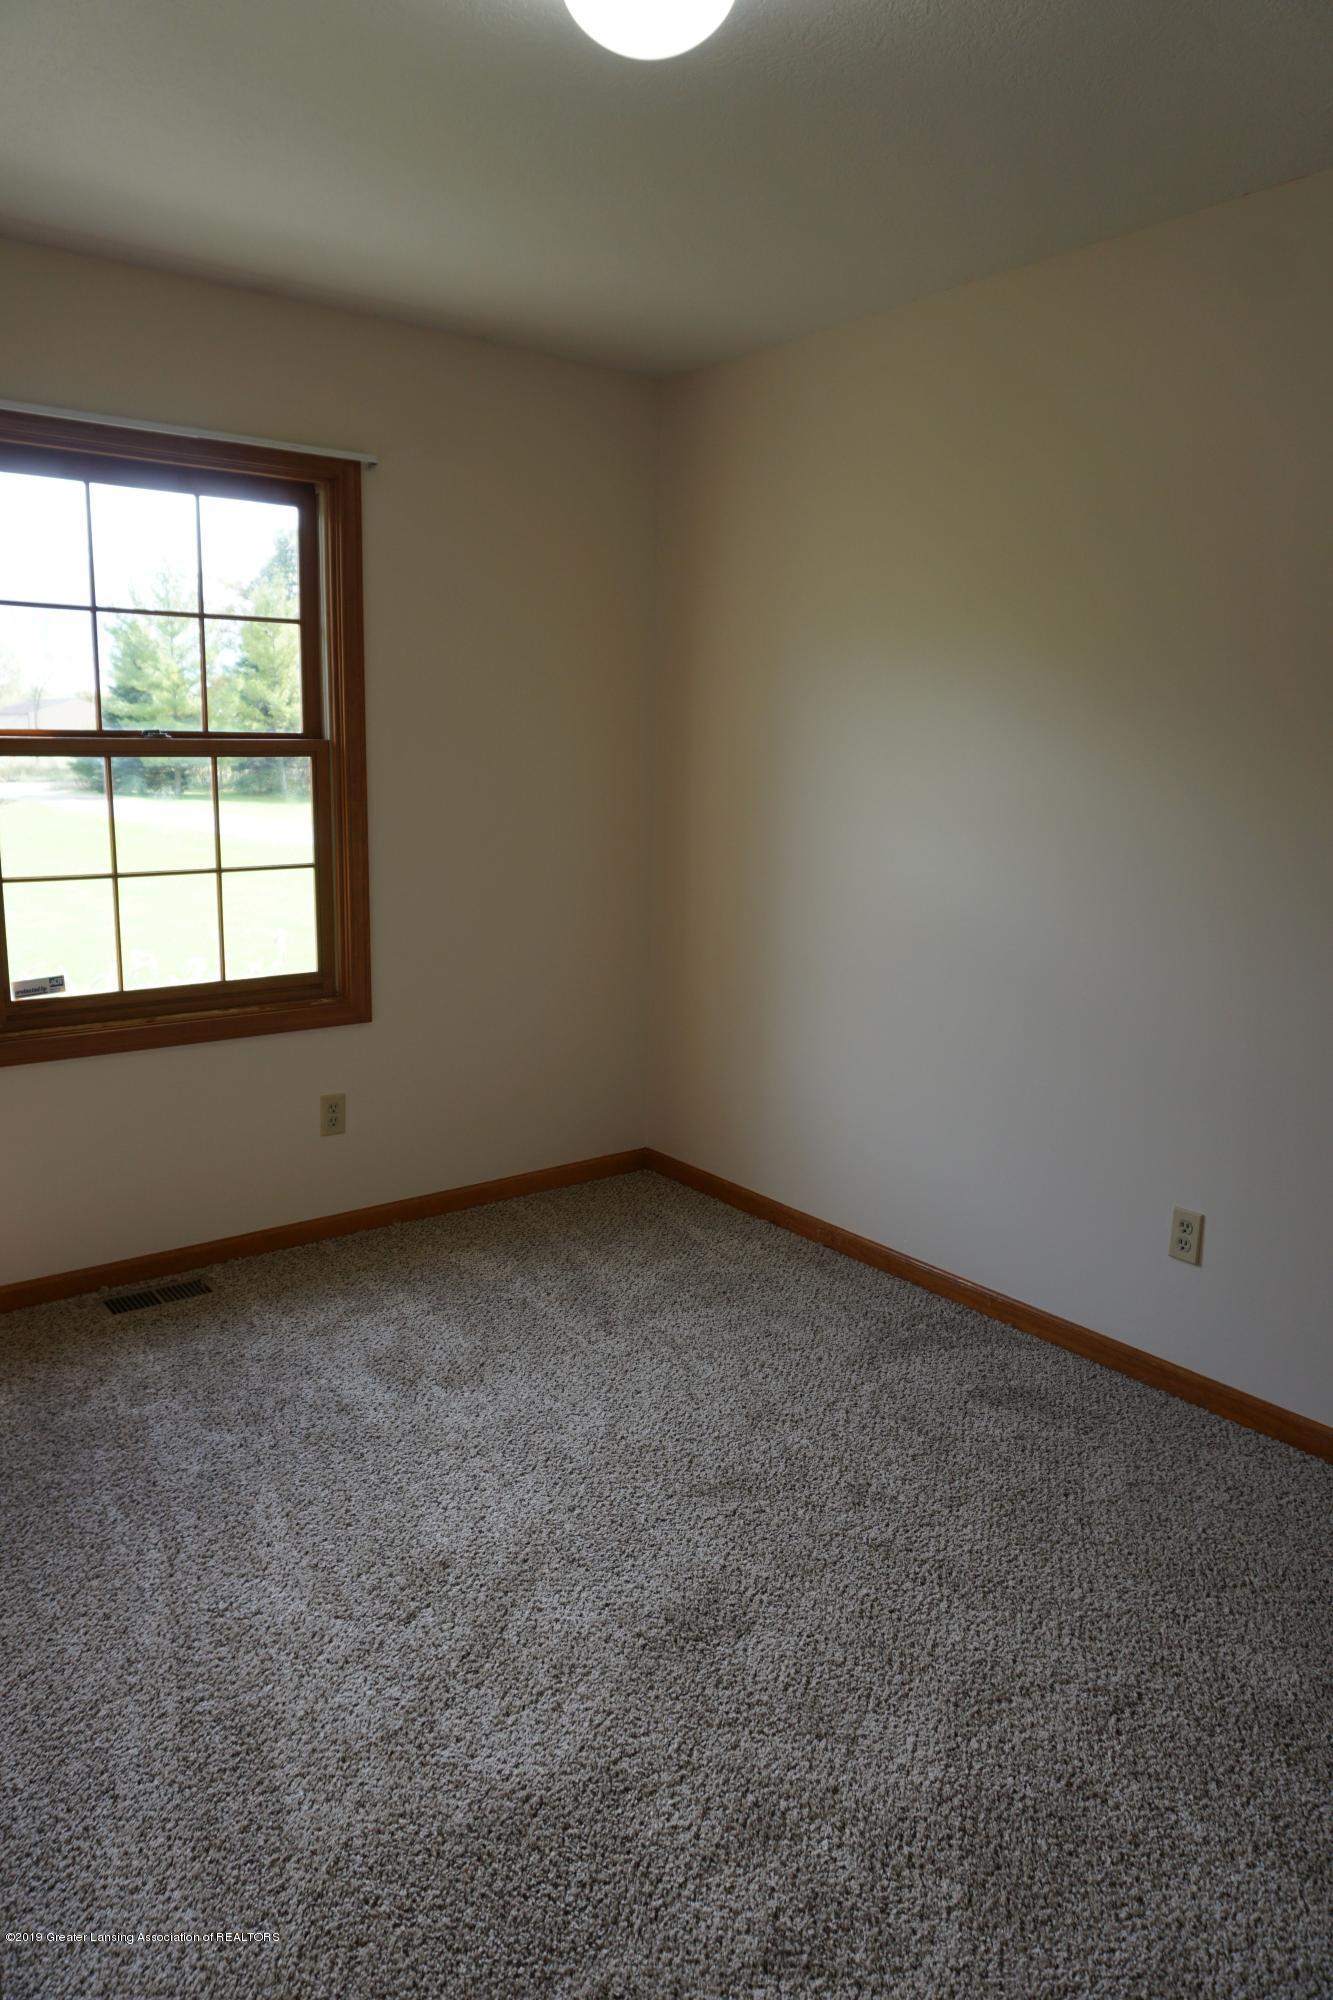 10130 Hollister Rd - Bedroom #3 - 27